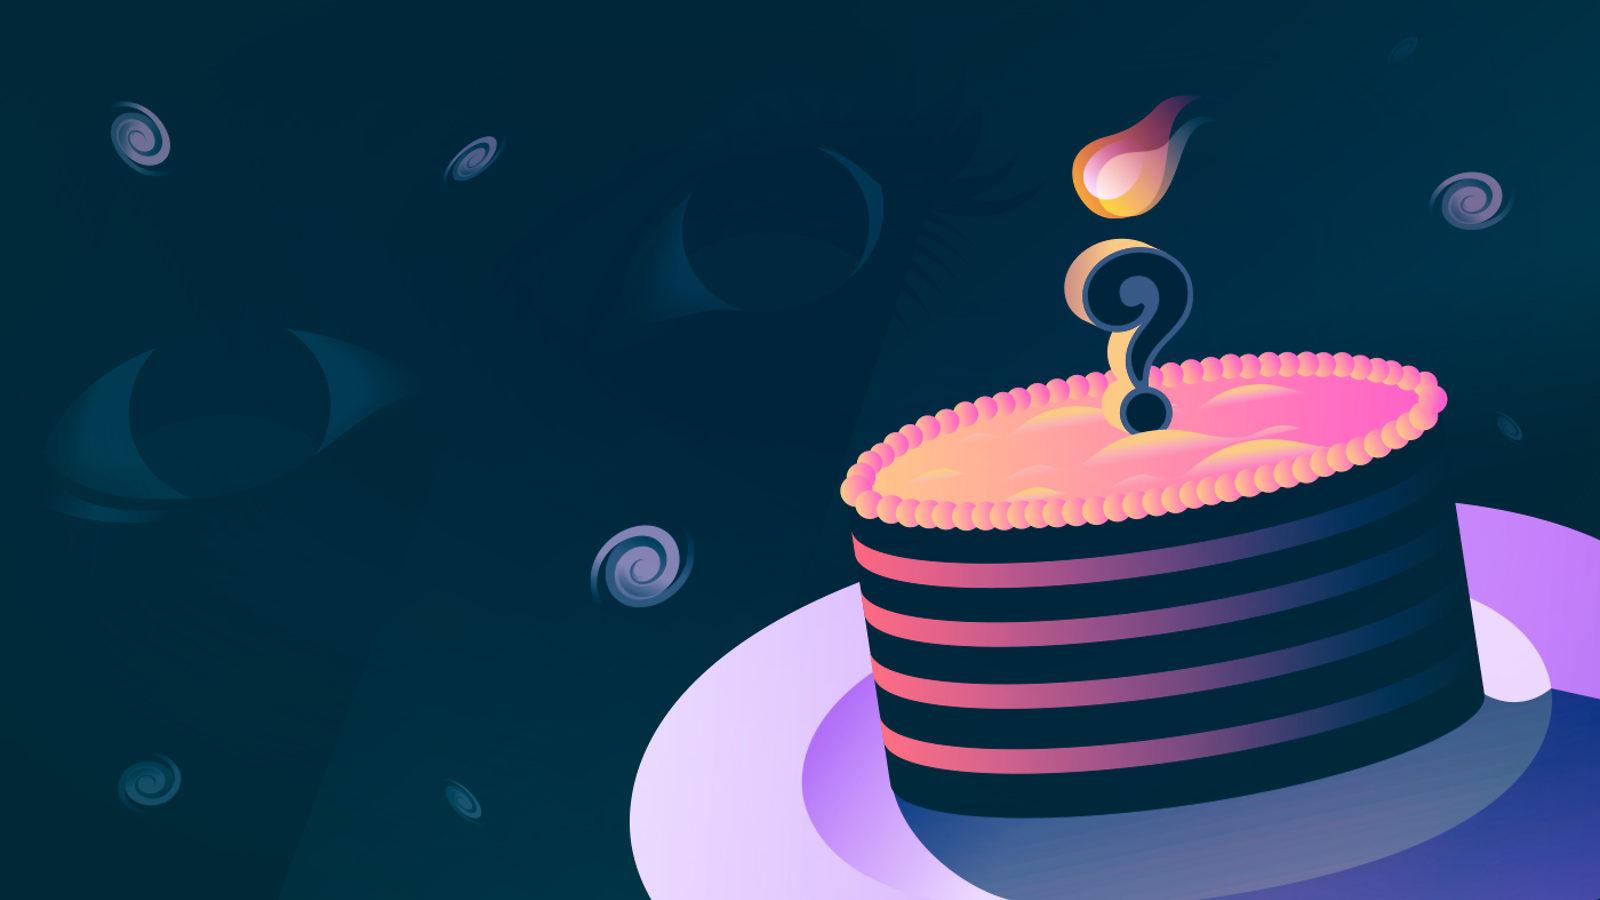 Illustration of universe cake